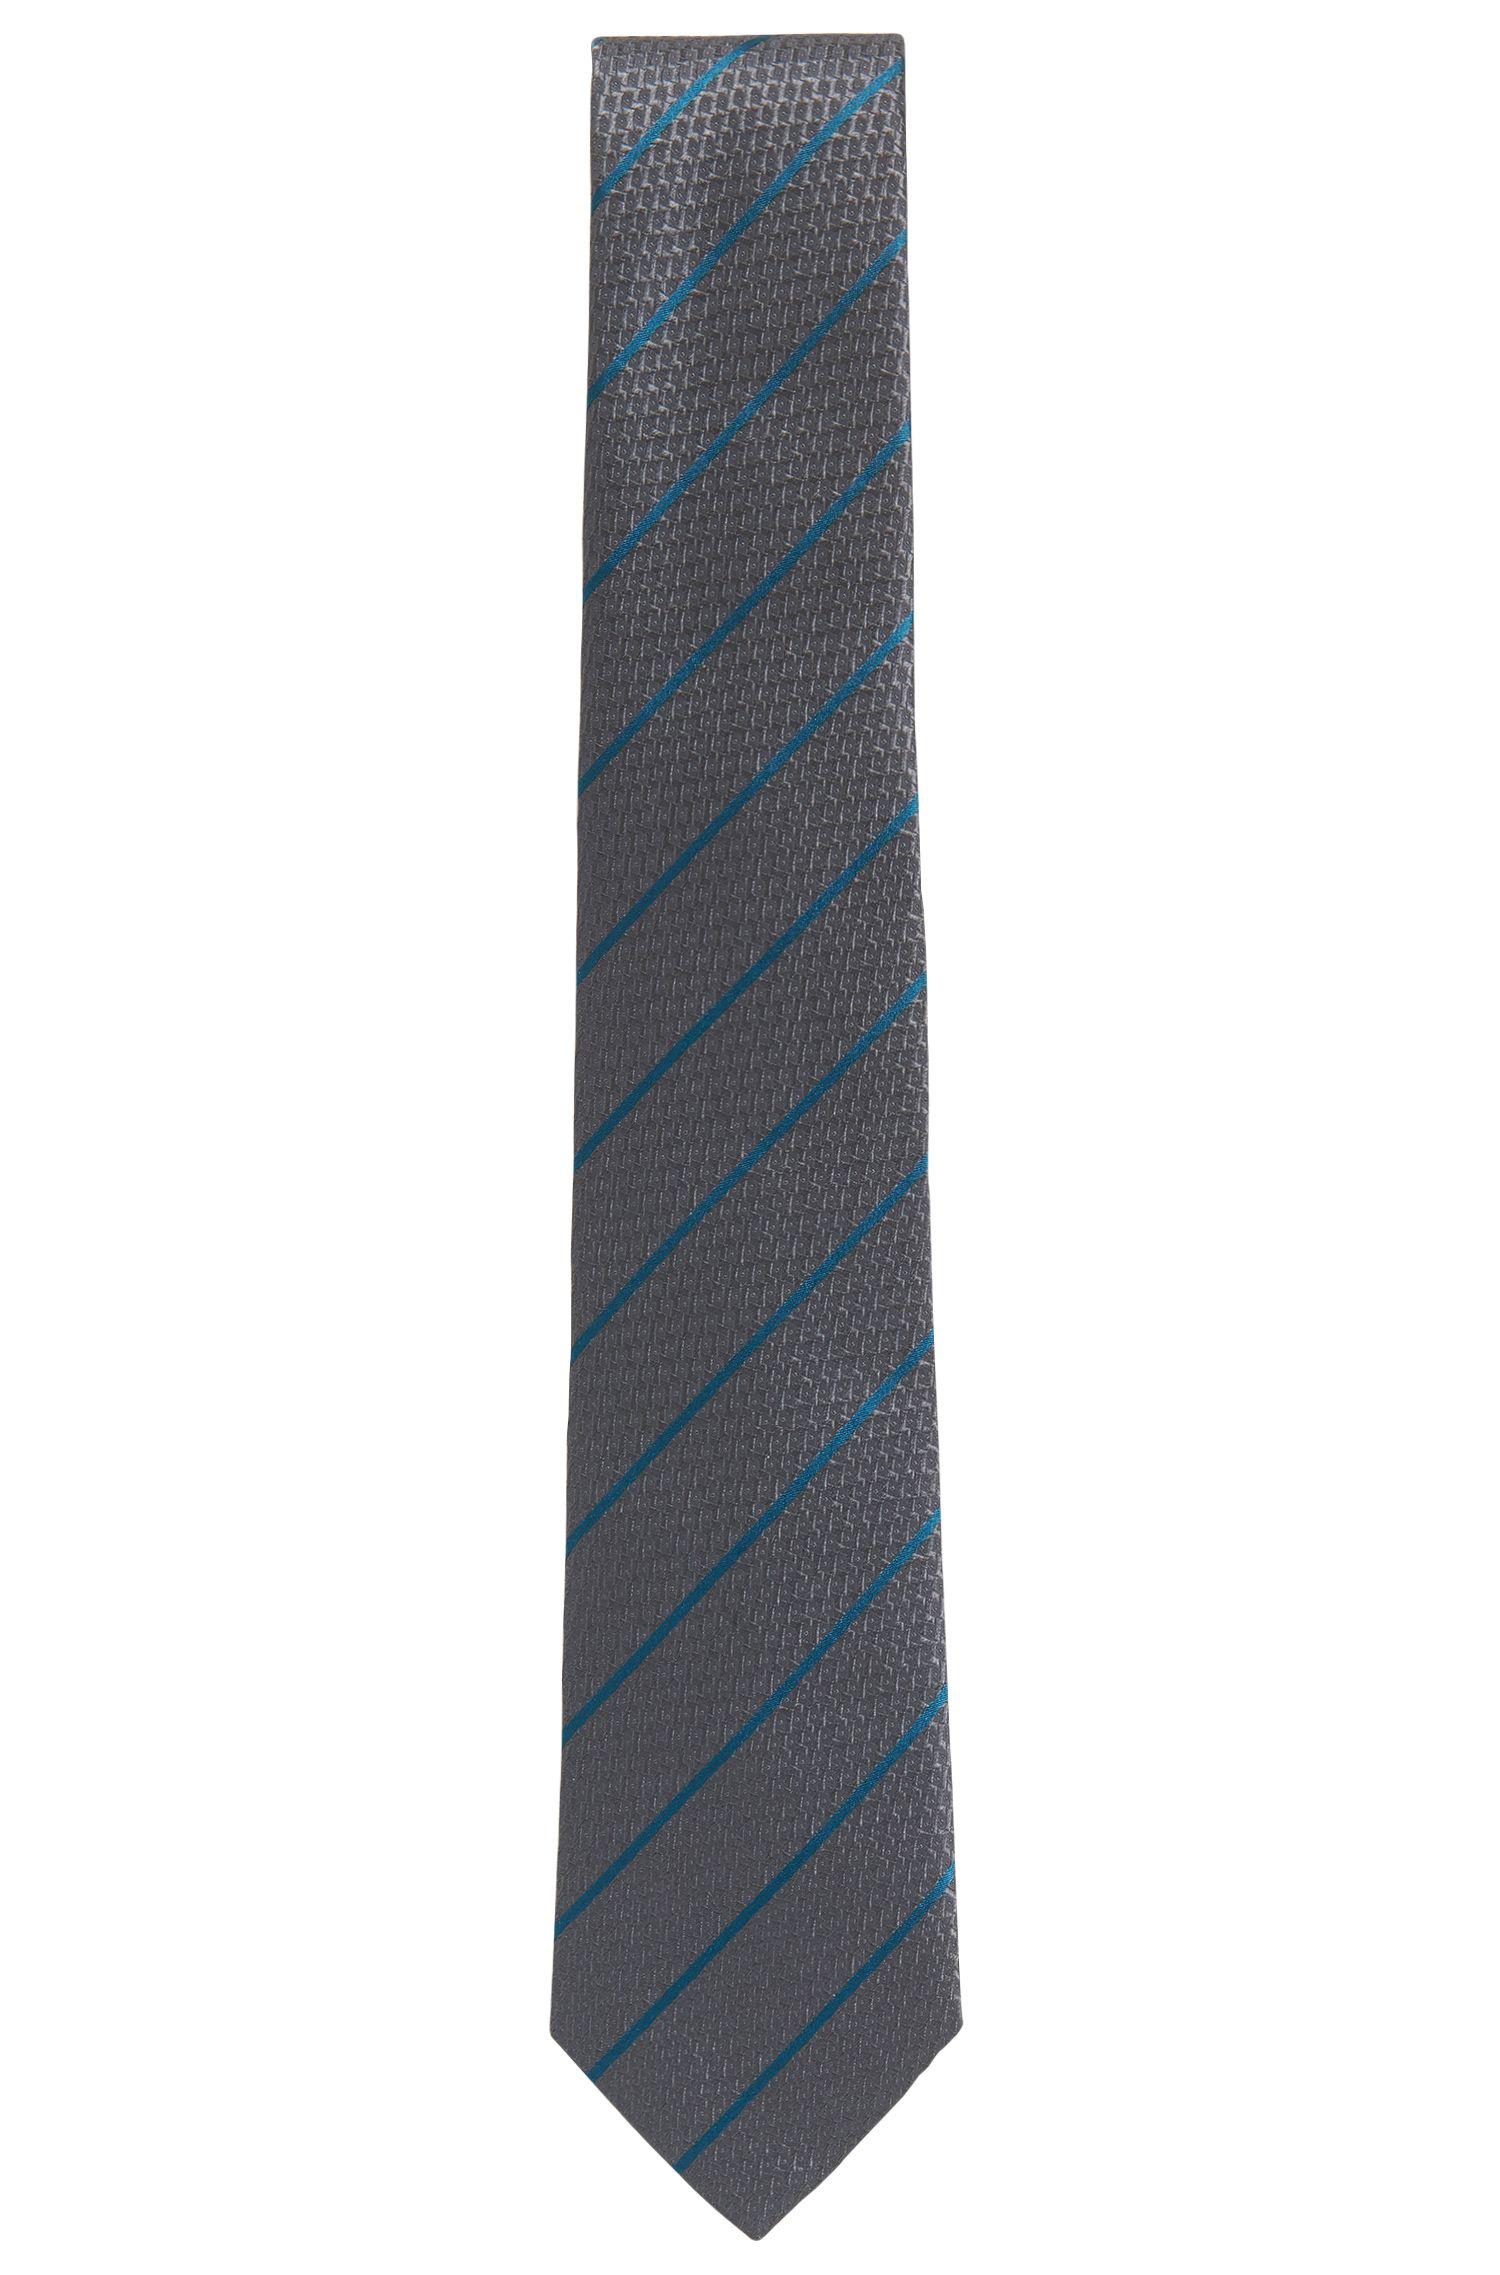 'T-Tie 7.5 cm' | Regular, Italian Silk Tie